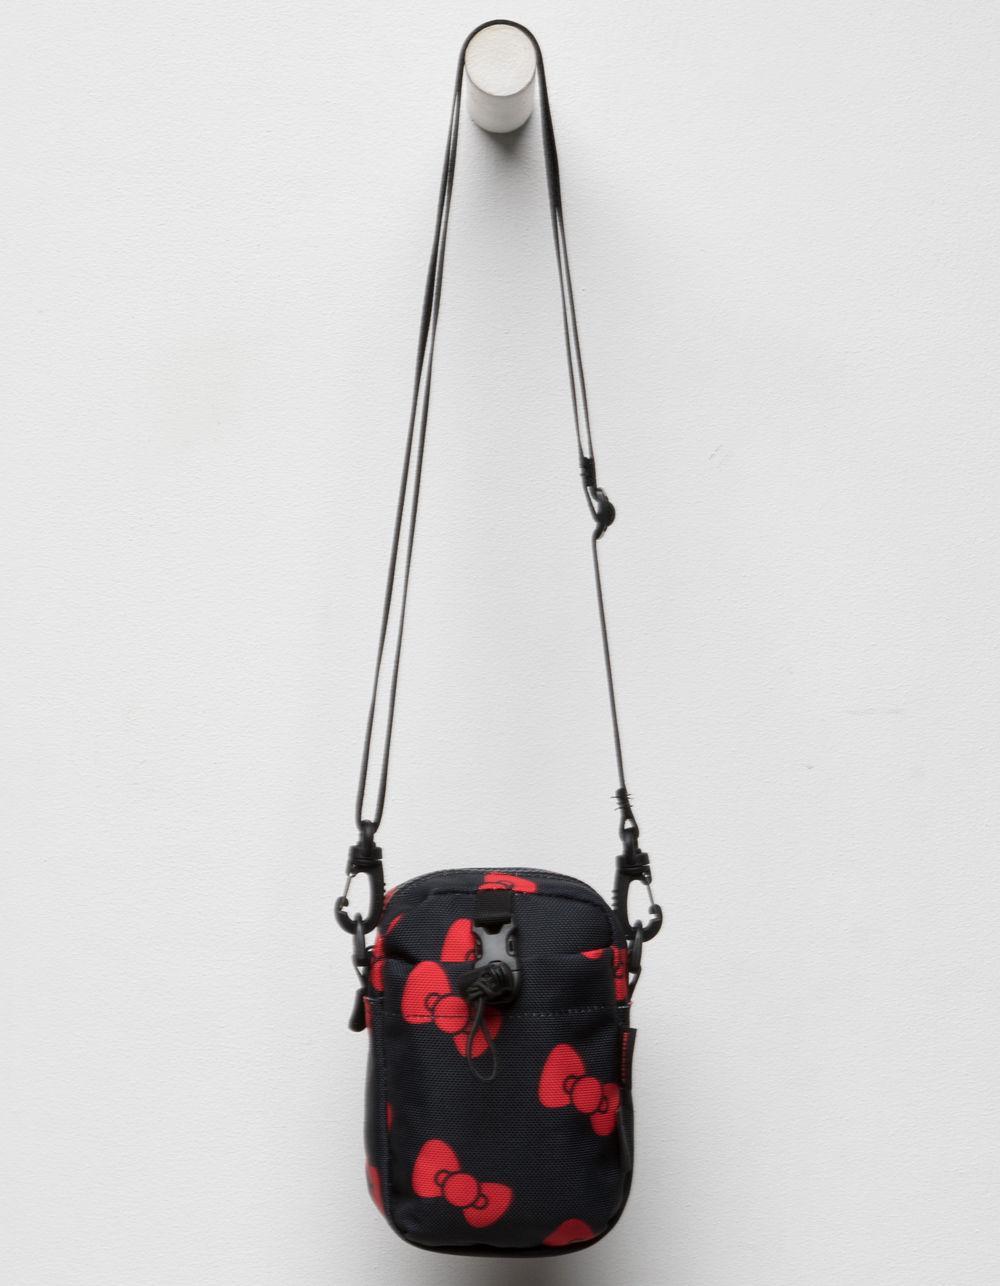 e03b26a1a5 Lyst - Converse X Hello Kitty Black Mini Crossbody Bag in Black